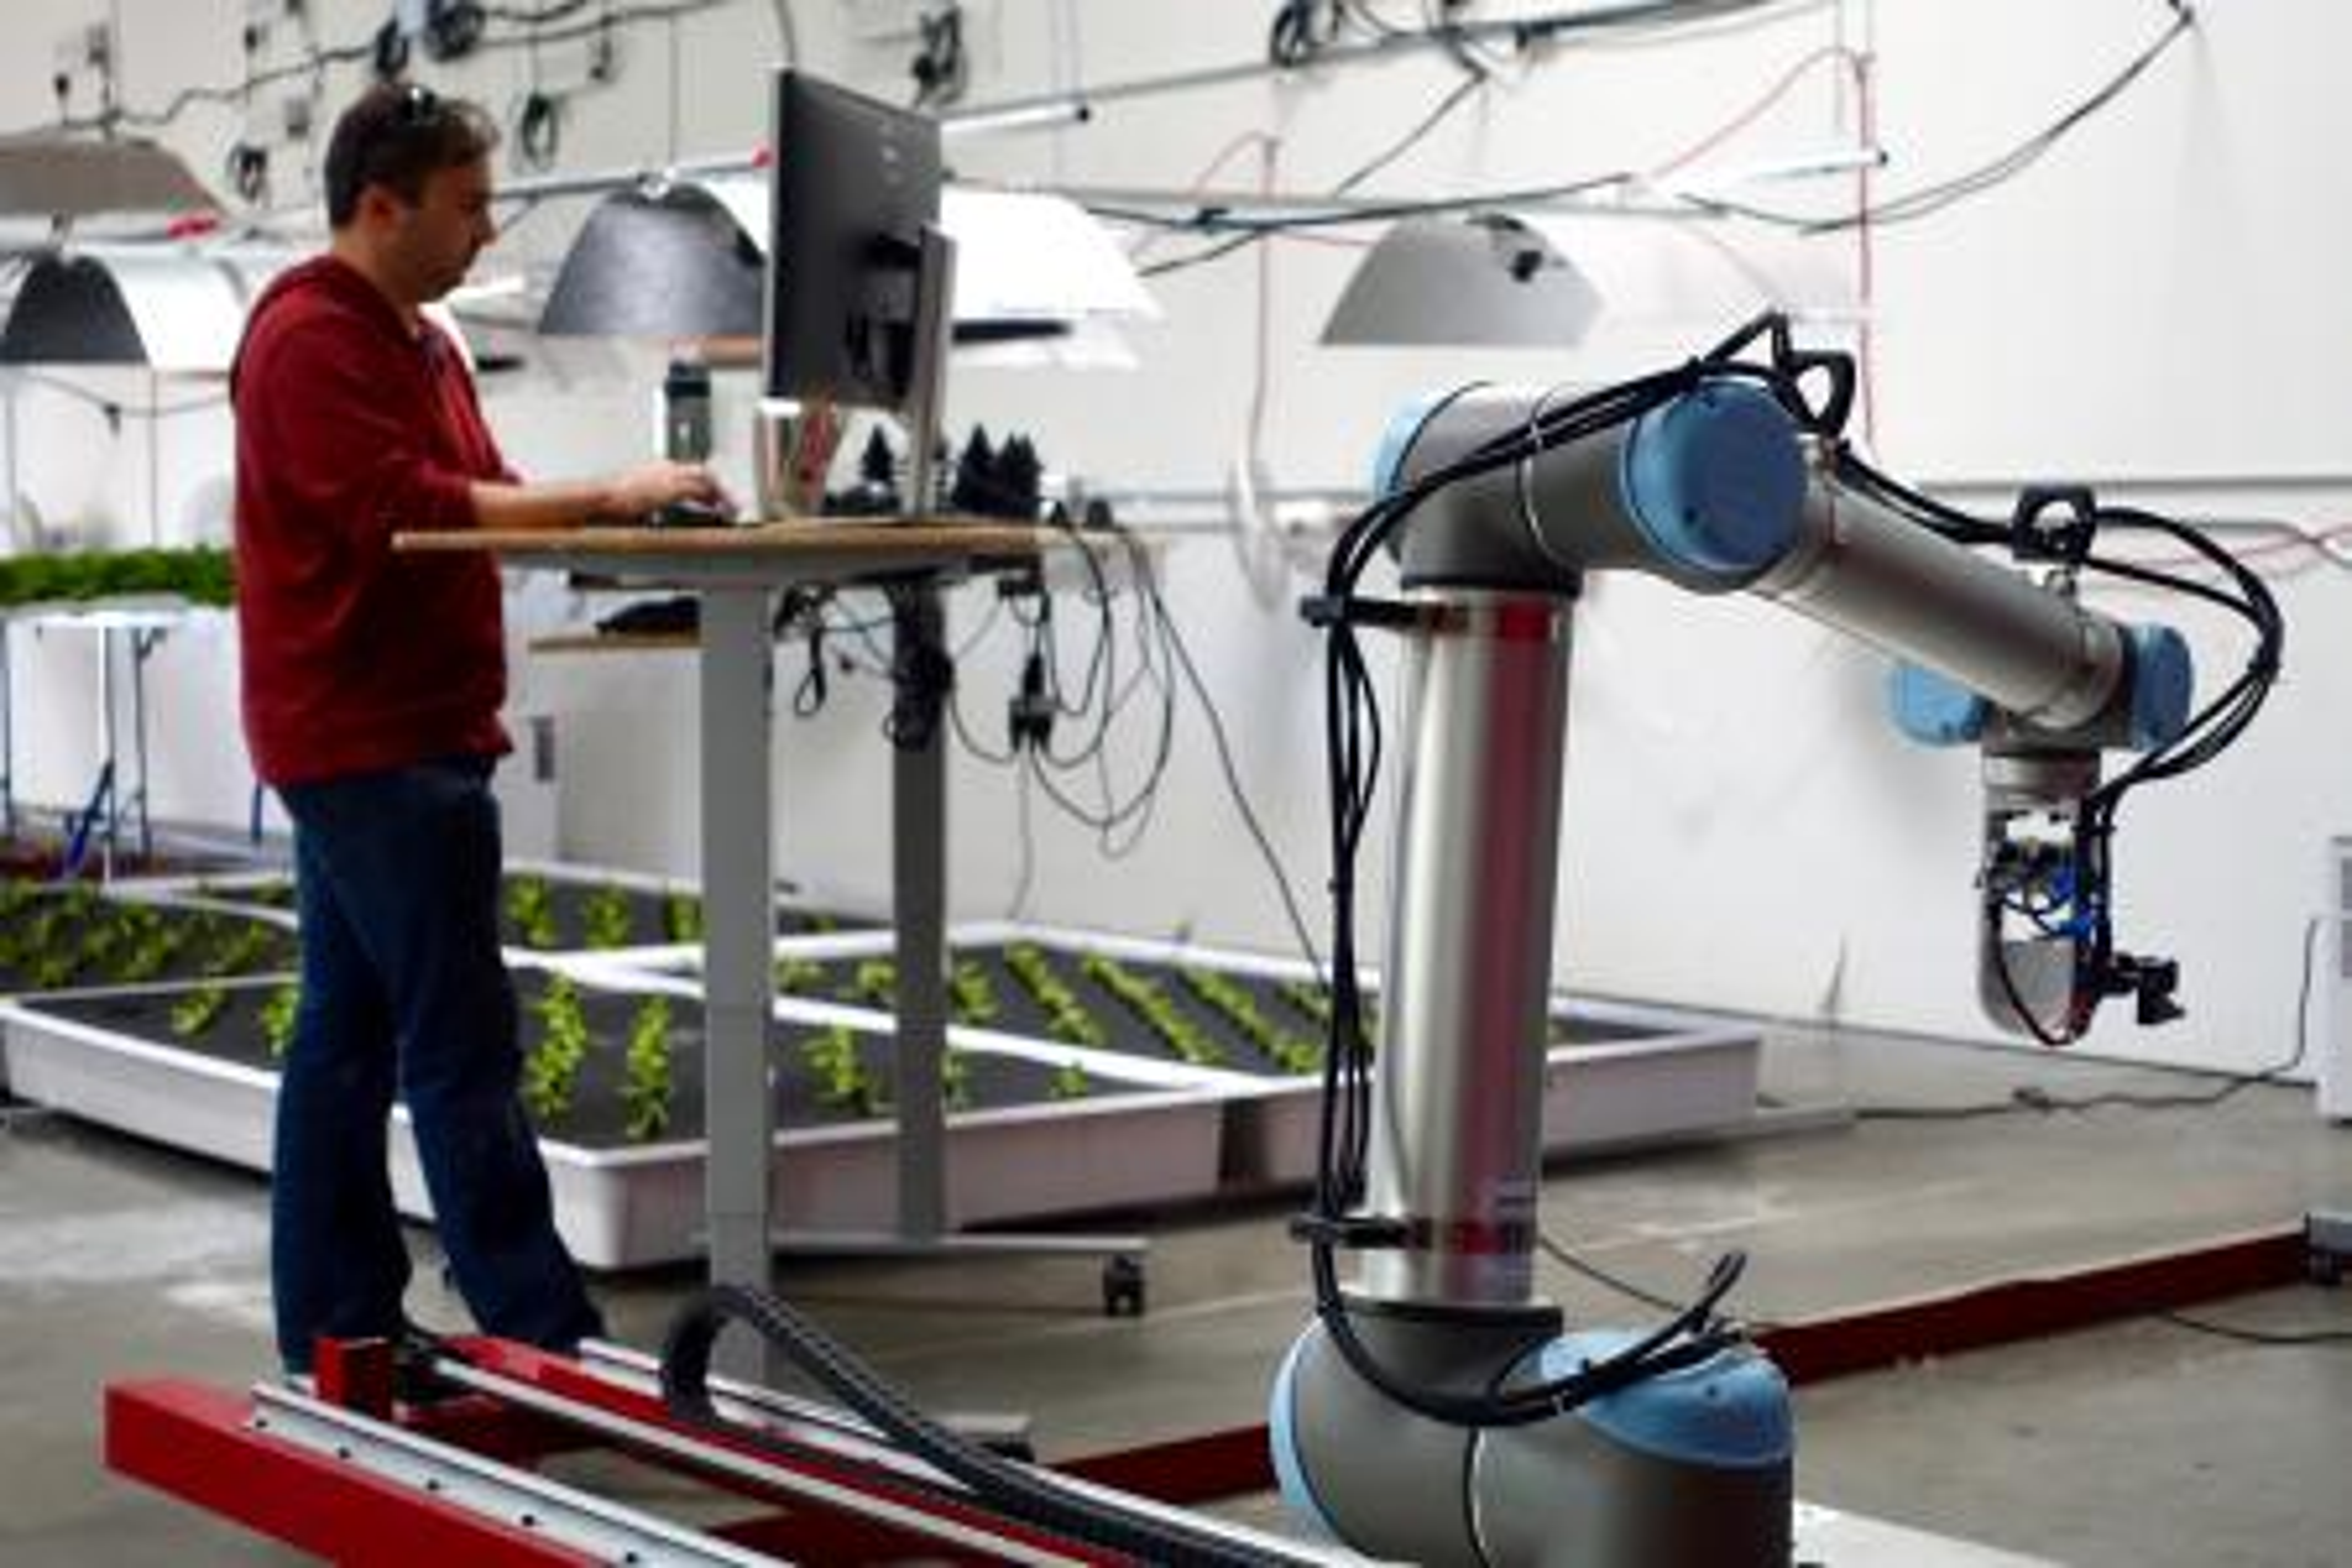 Iron ox farming robots